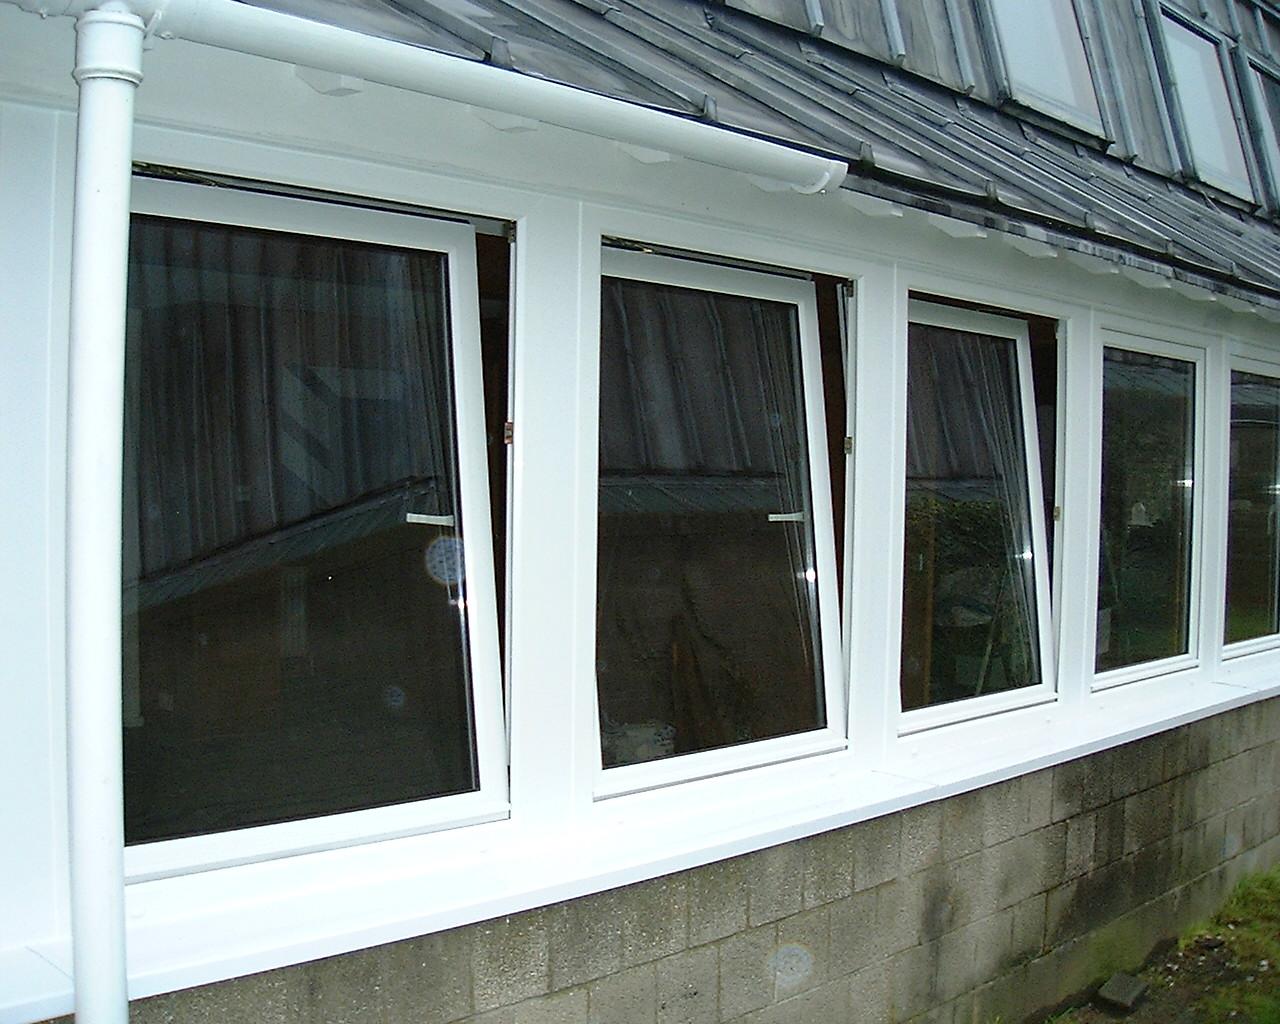 Commercial Tilt And Turn Windows : Tilt turn pivot and h or reversable window openers a